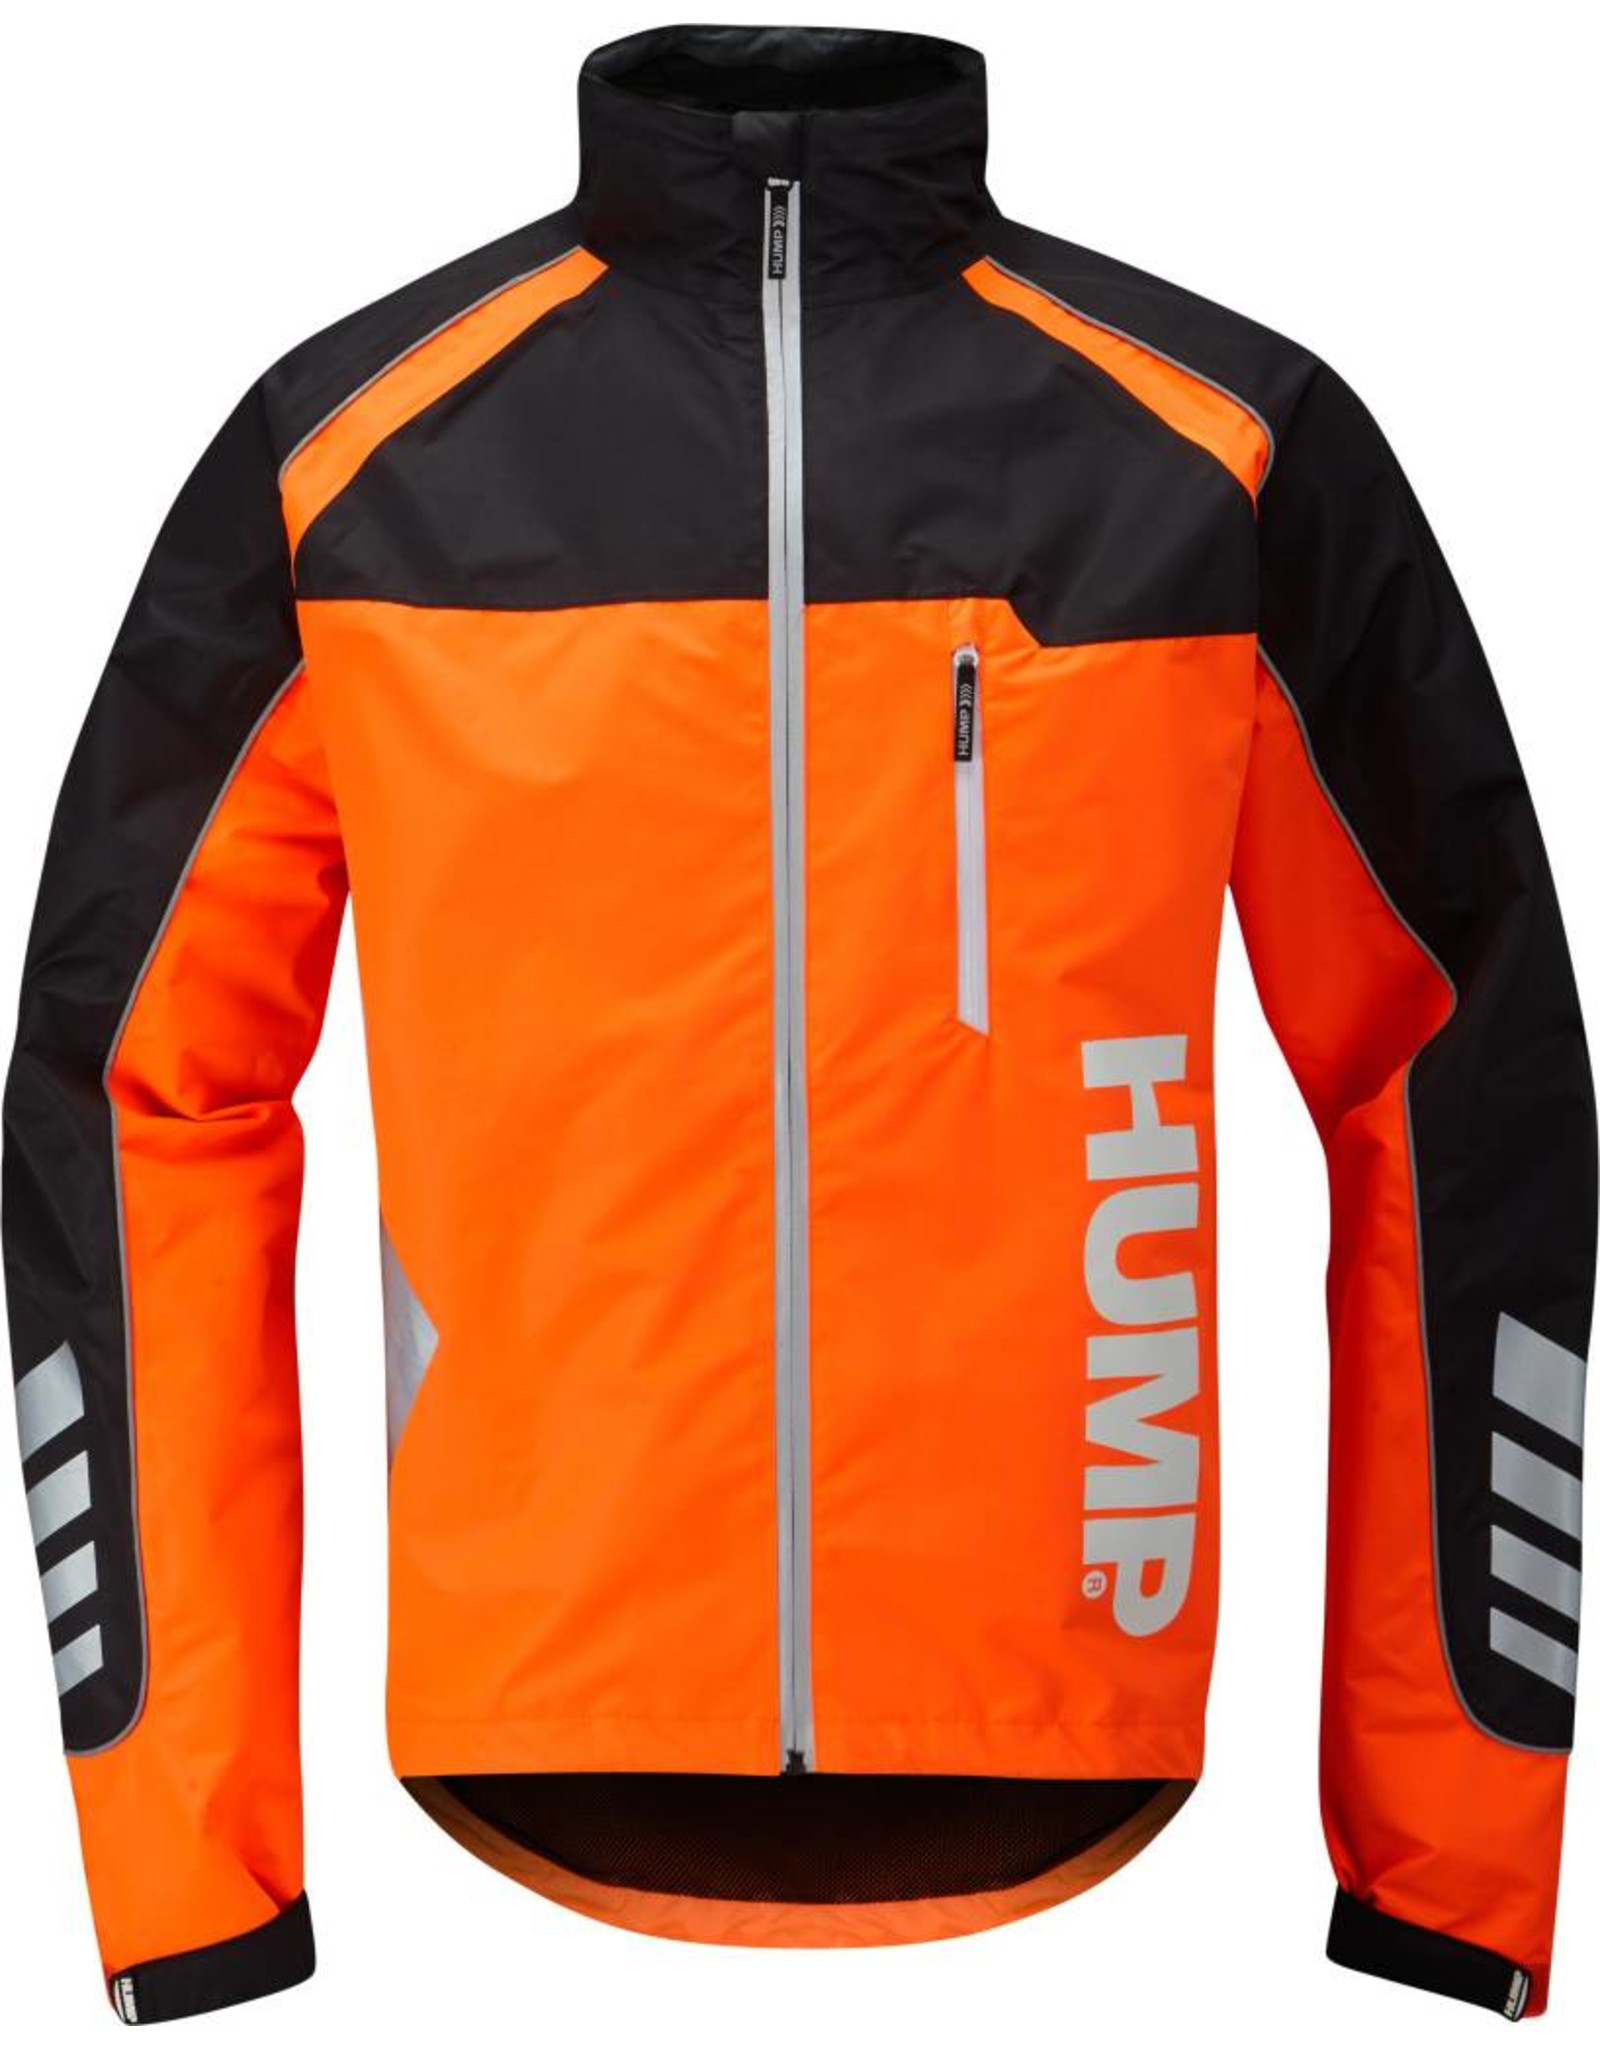 Hump Strobe Men's Waterproof Jacket Orange